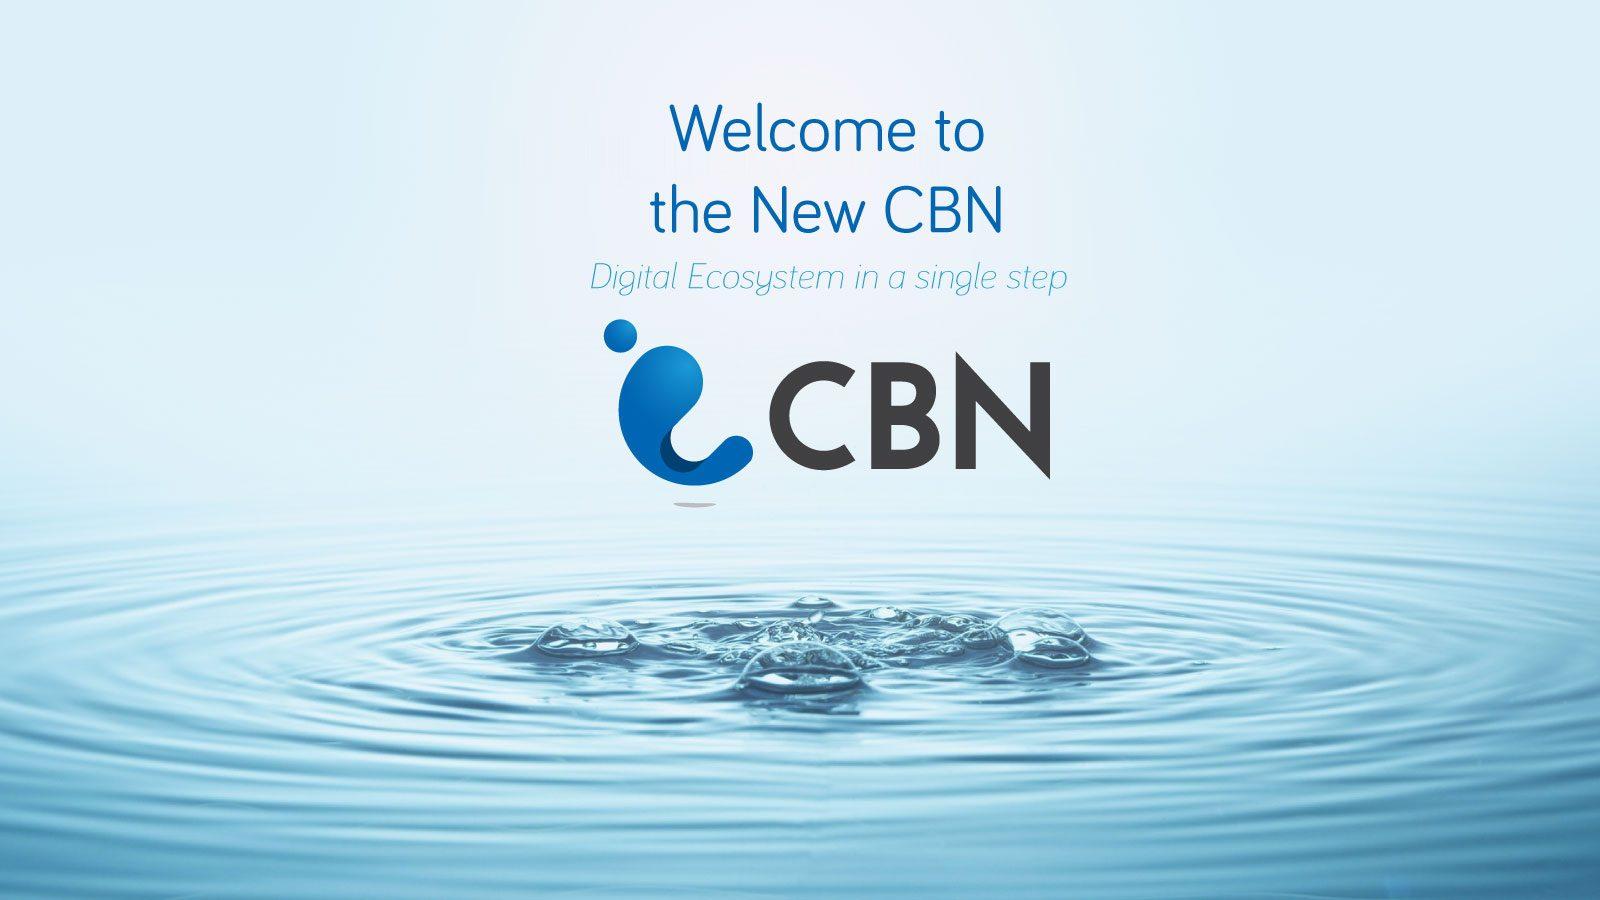 Услуги оператора CBN на Бали